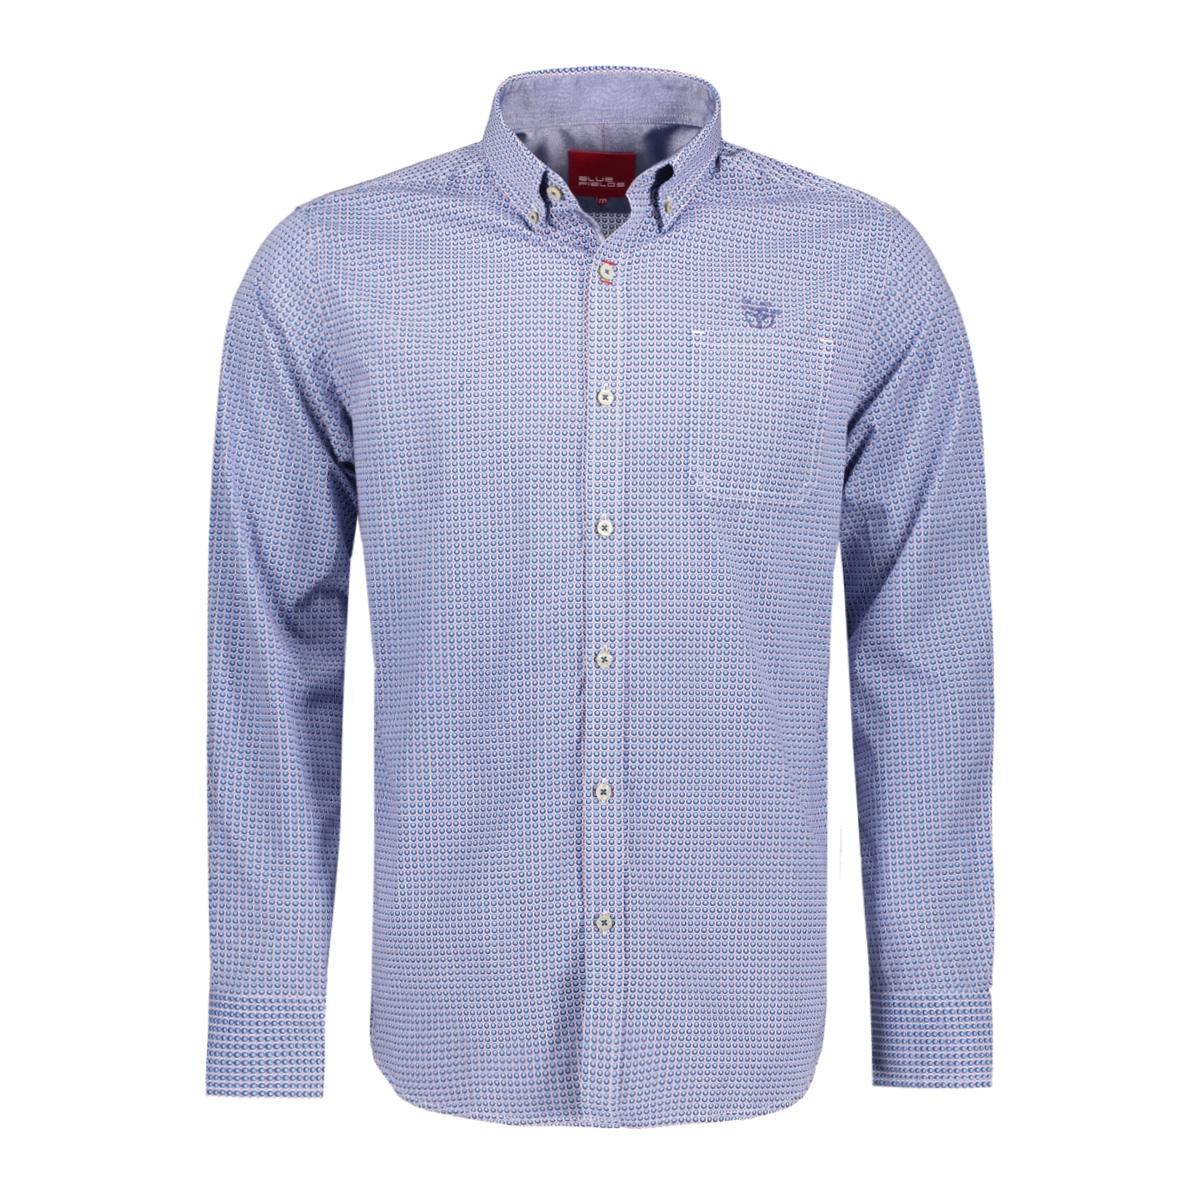 214-37003 bluefields overhemd 4257